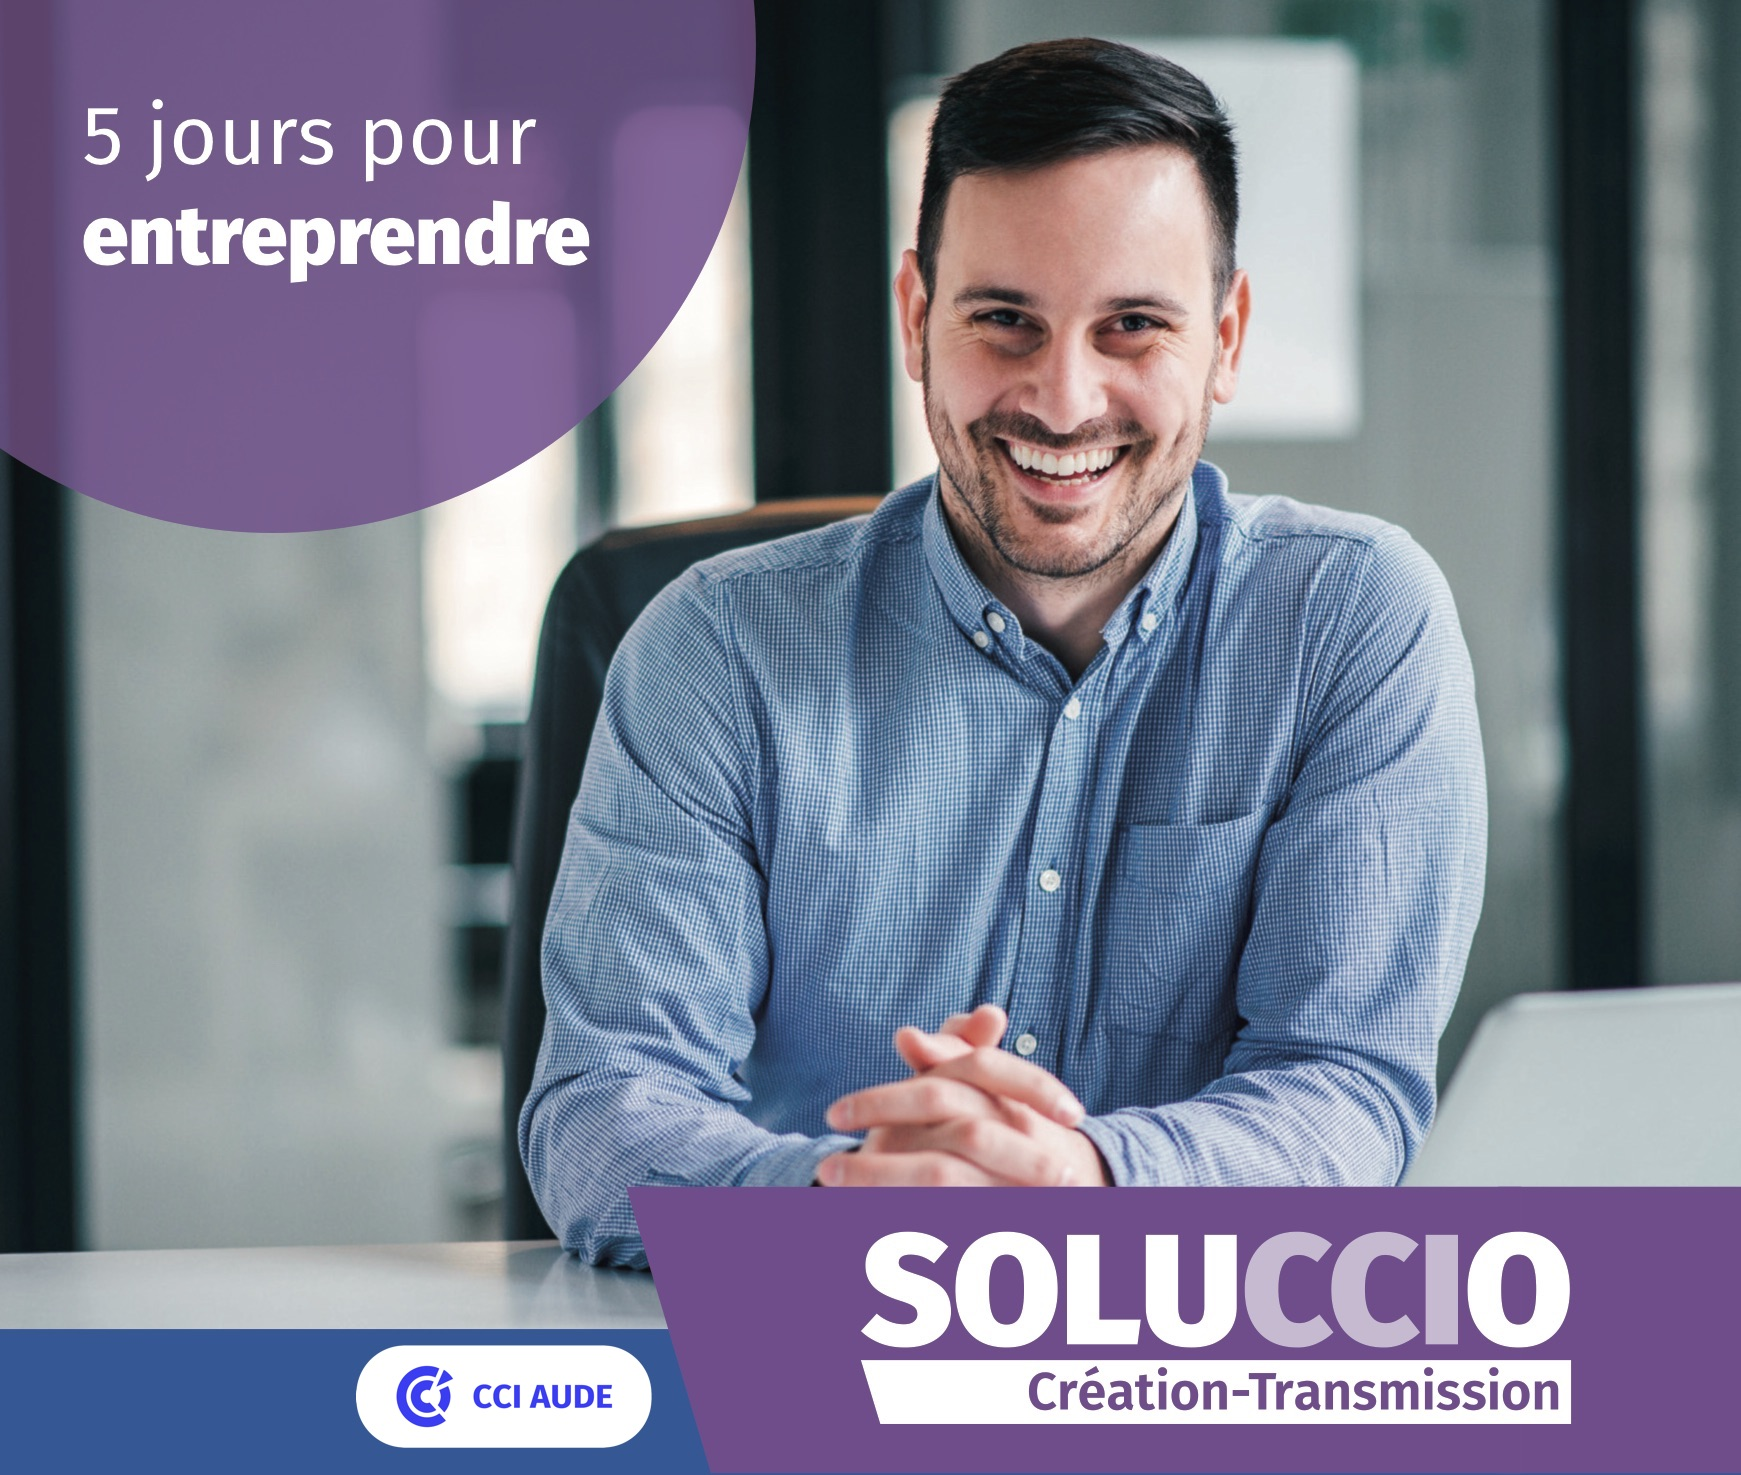 2020 visuel Soluccio - cciaude - 5 JPE